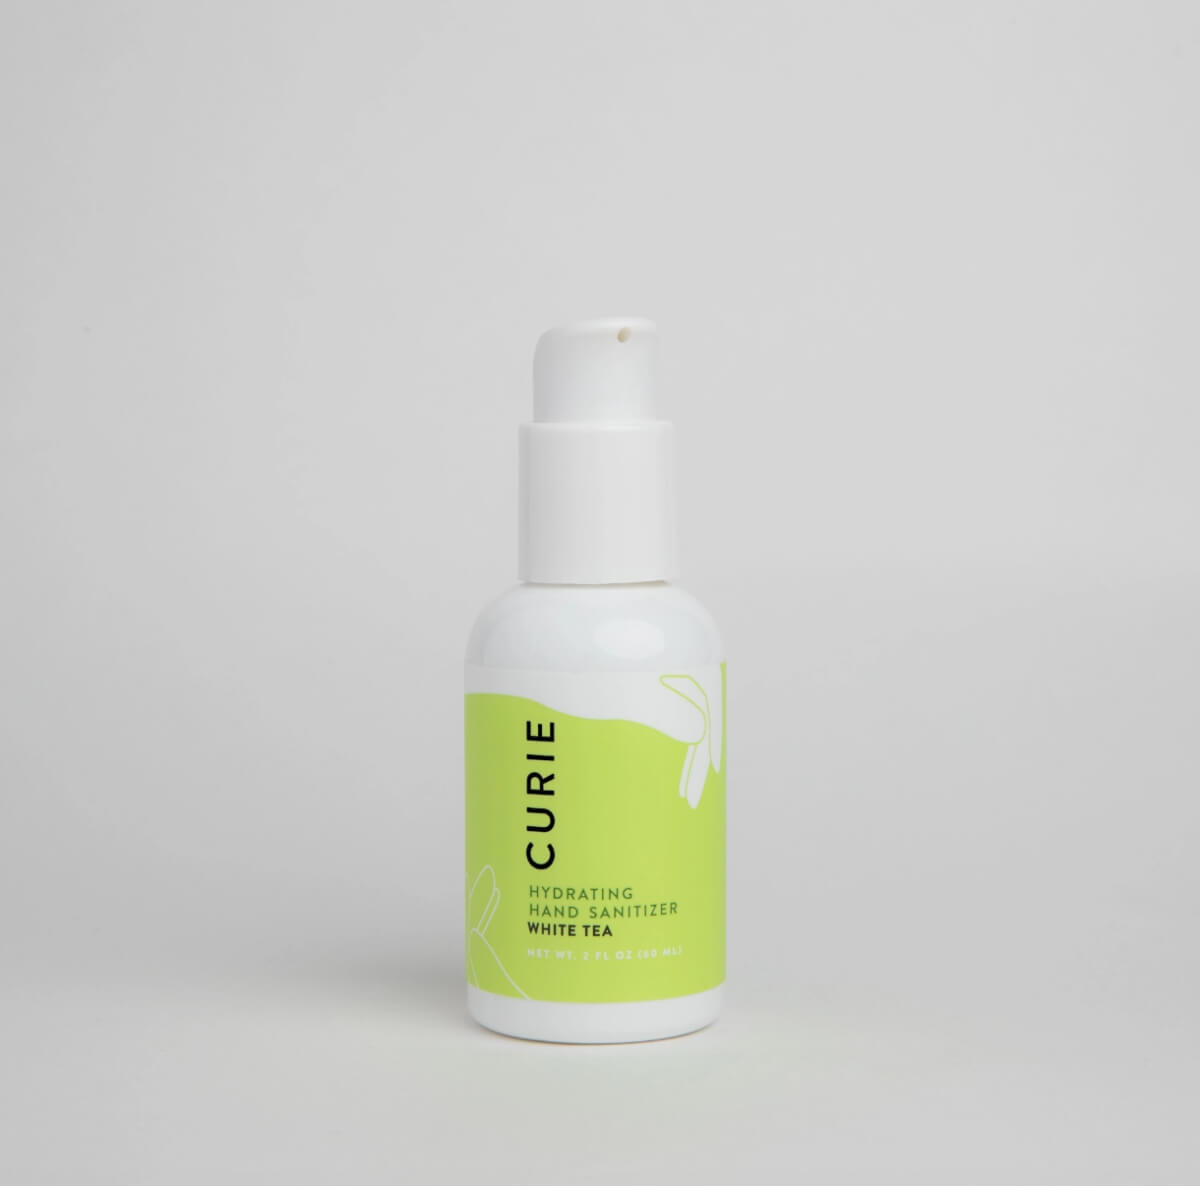 curie white tea hand sanitizer